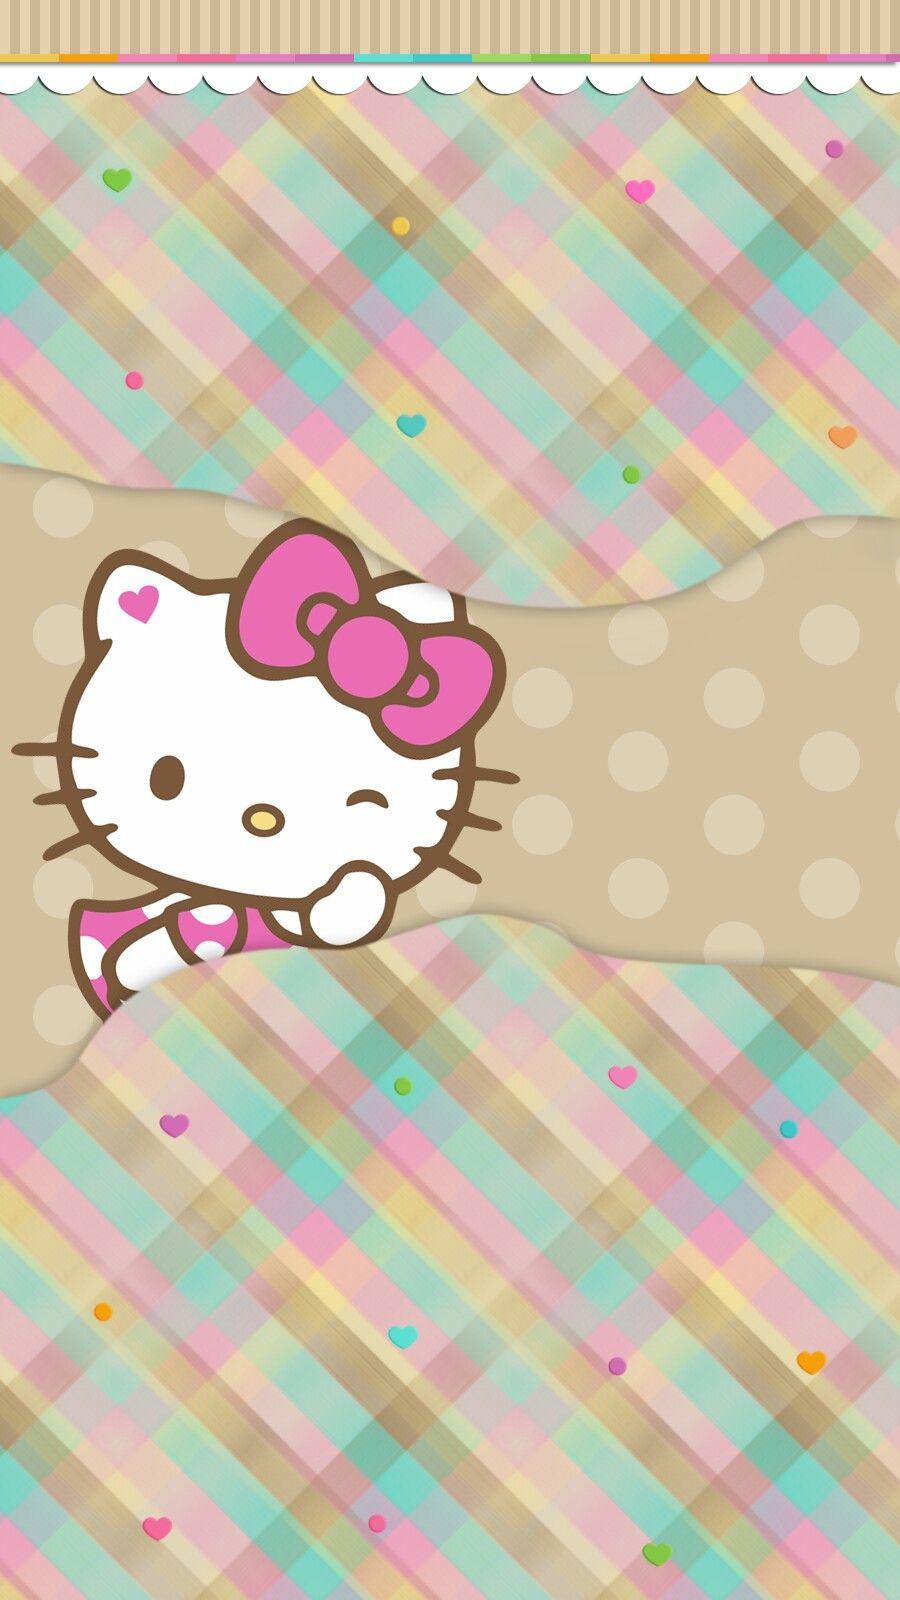 Download Wallpaper Hello Kitty Wall - 0abbfee1898be6ef4328dc96aa7a2cd2  Snapshot_869573.jpg